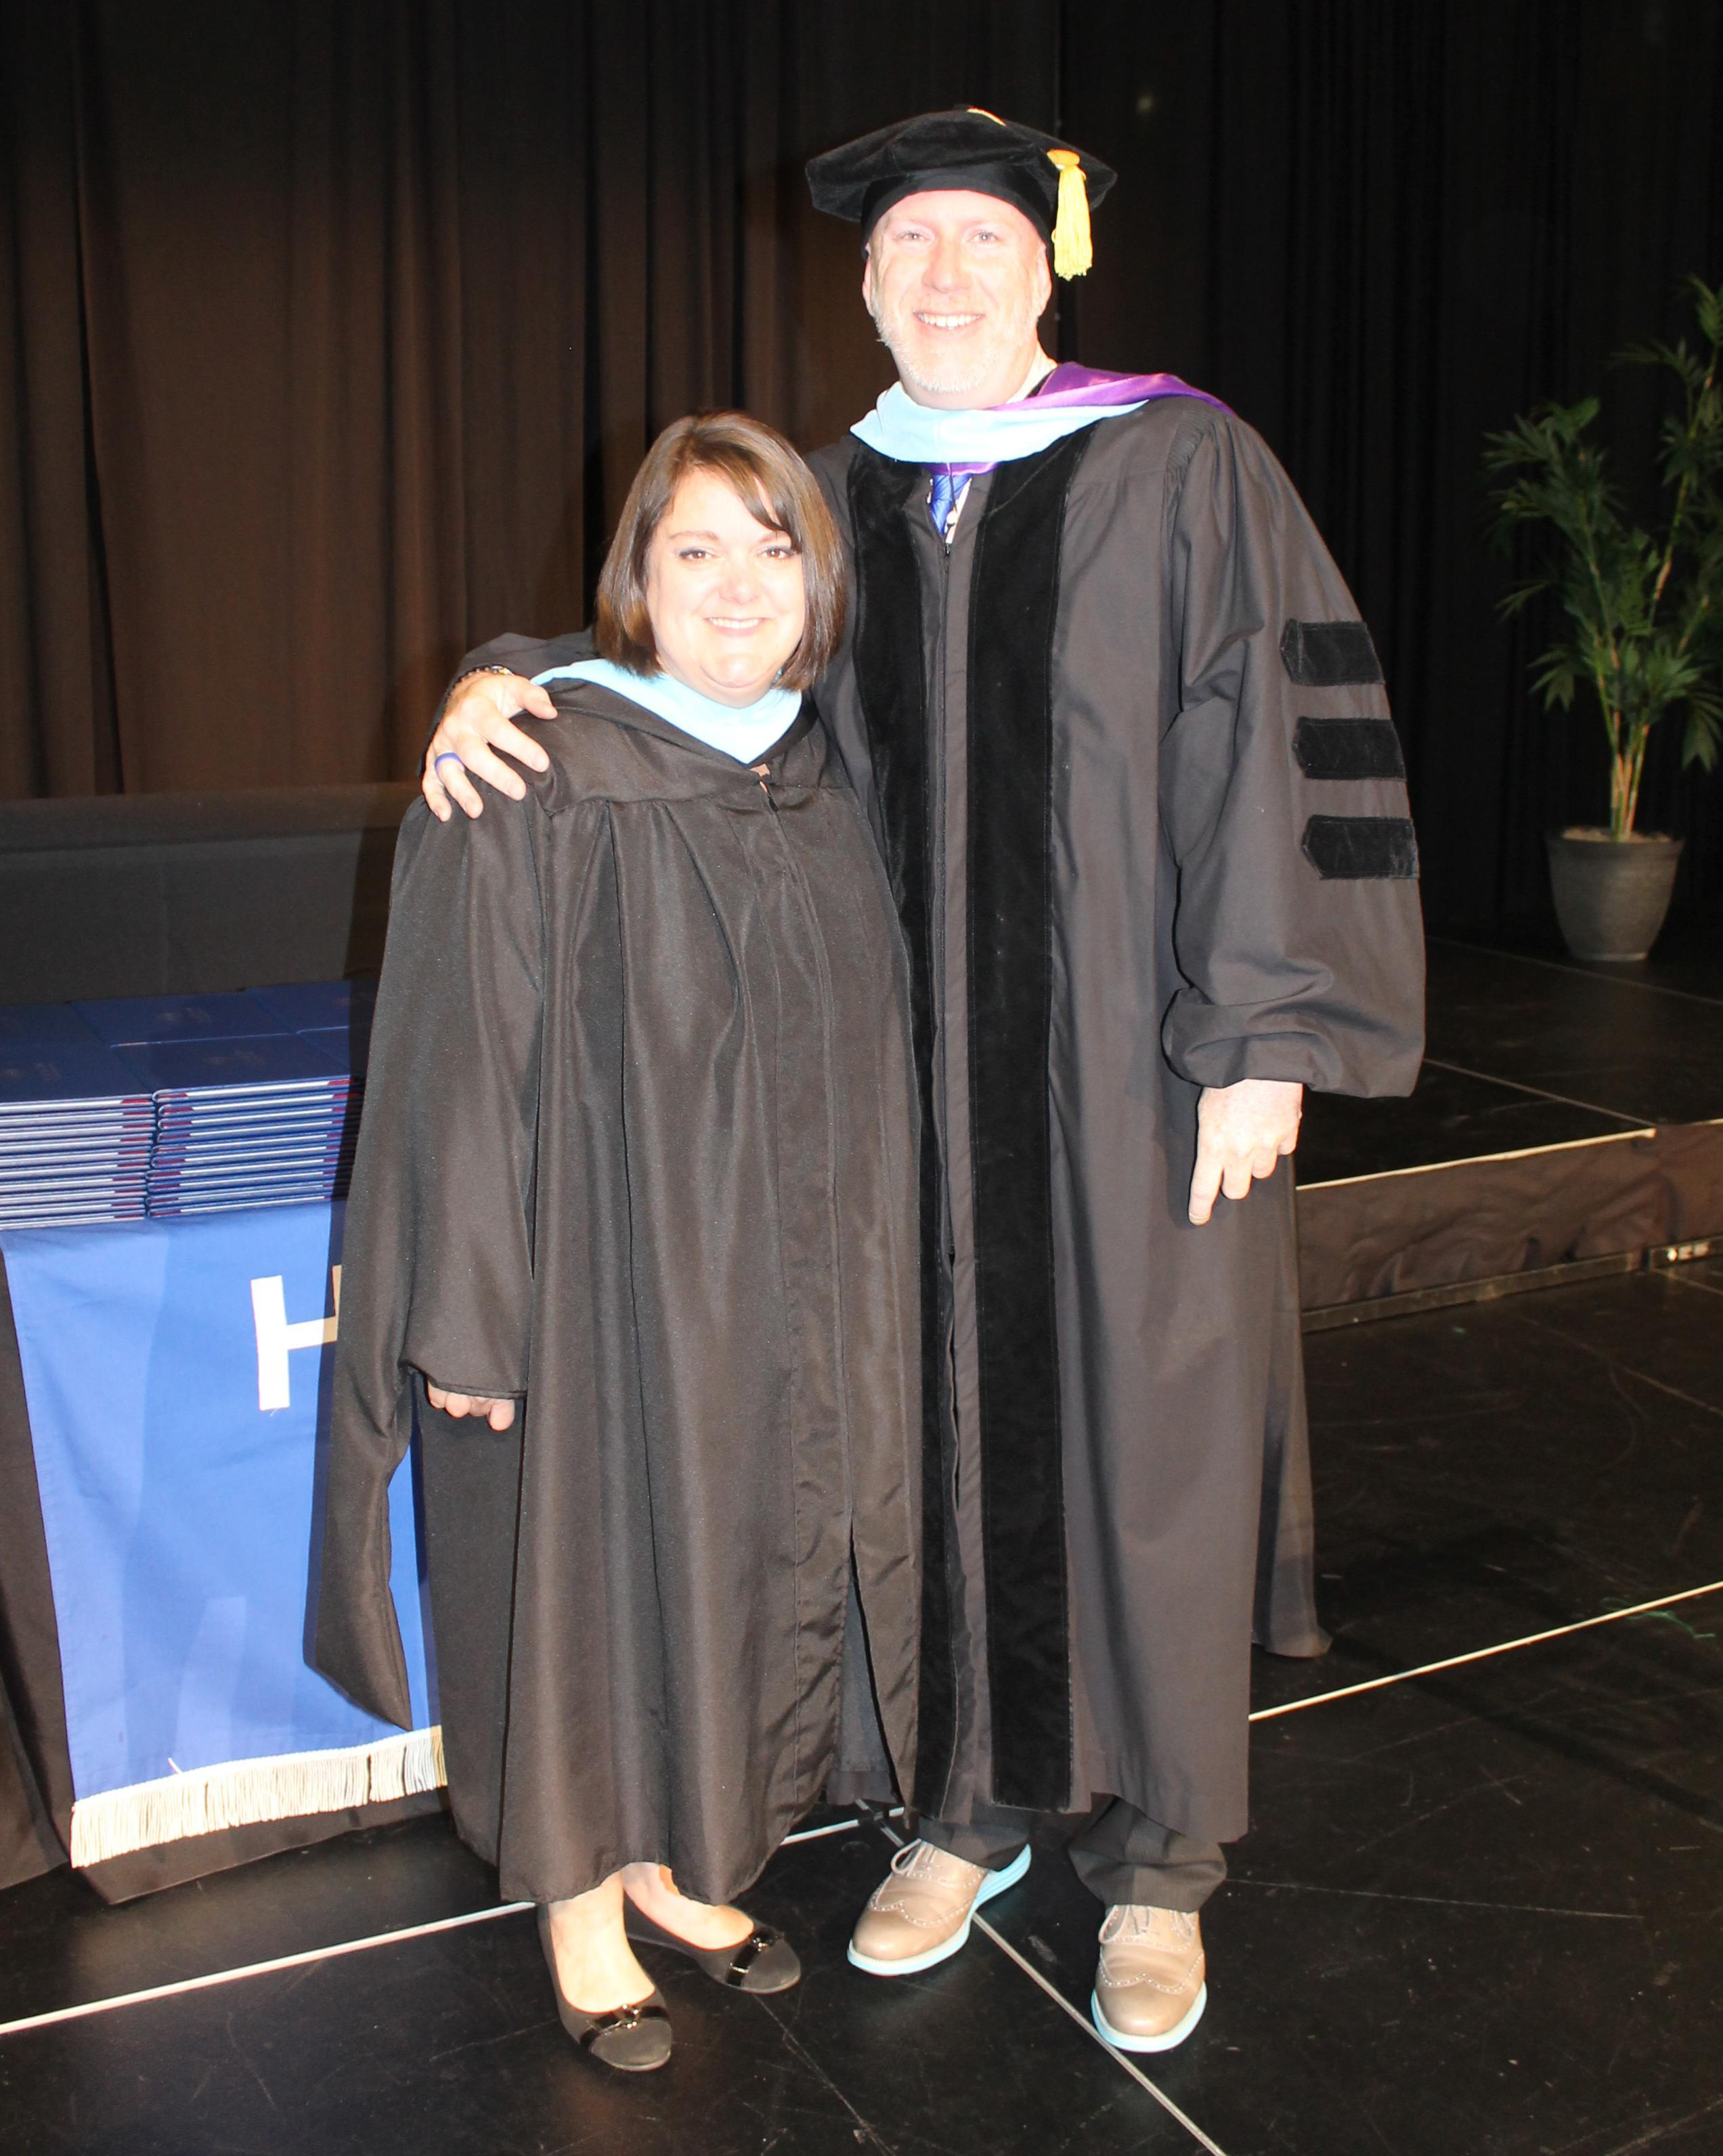 Assistant Principal Shannon Schliwa and Principal Dr. Lee Rector